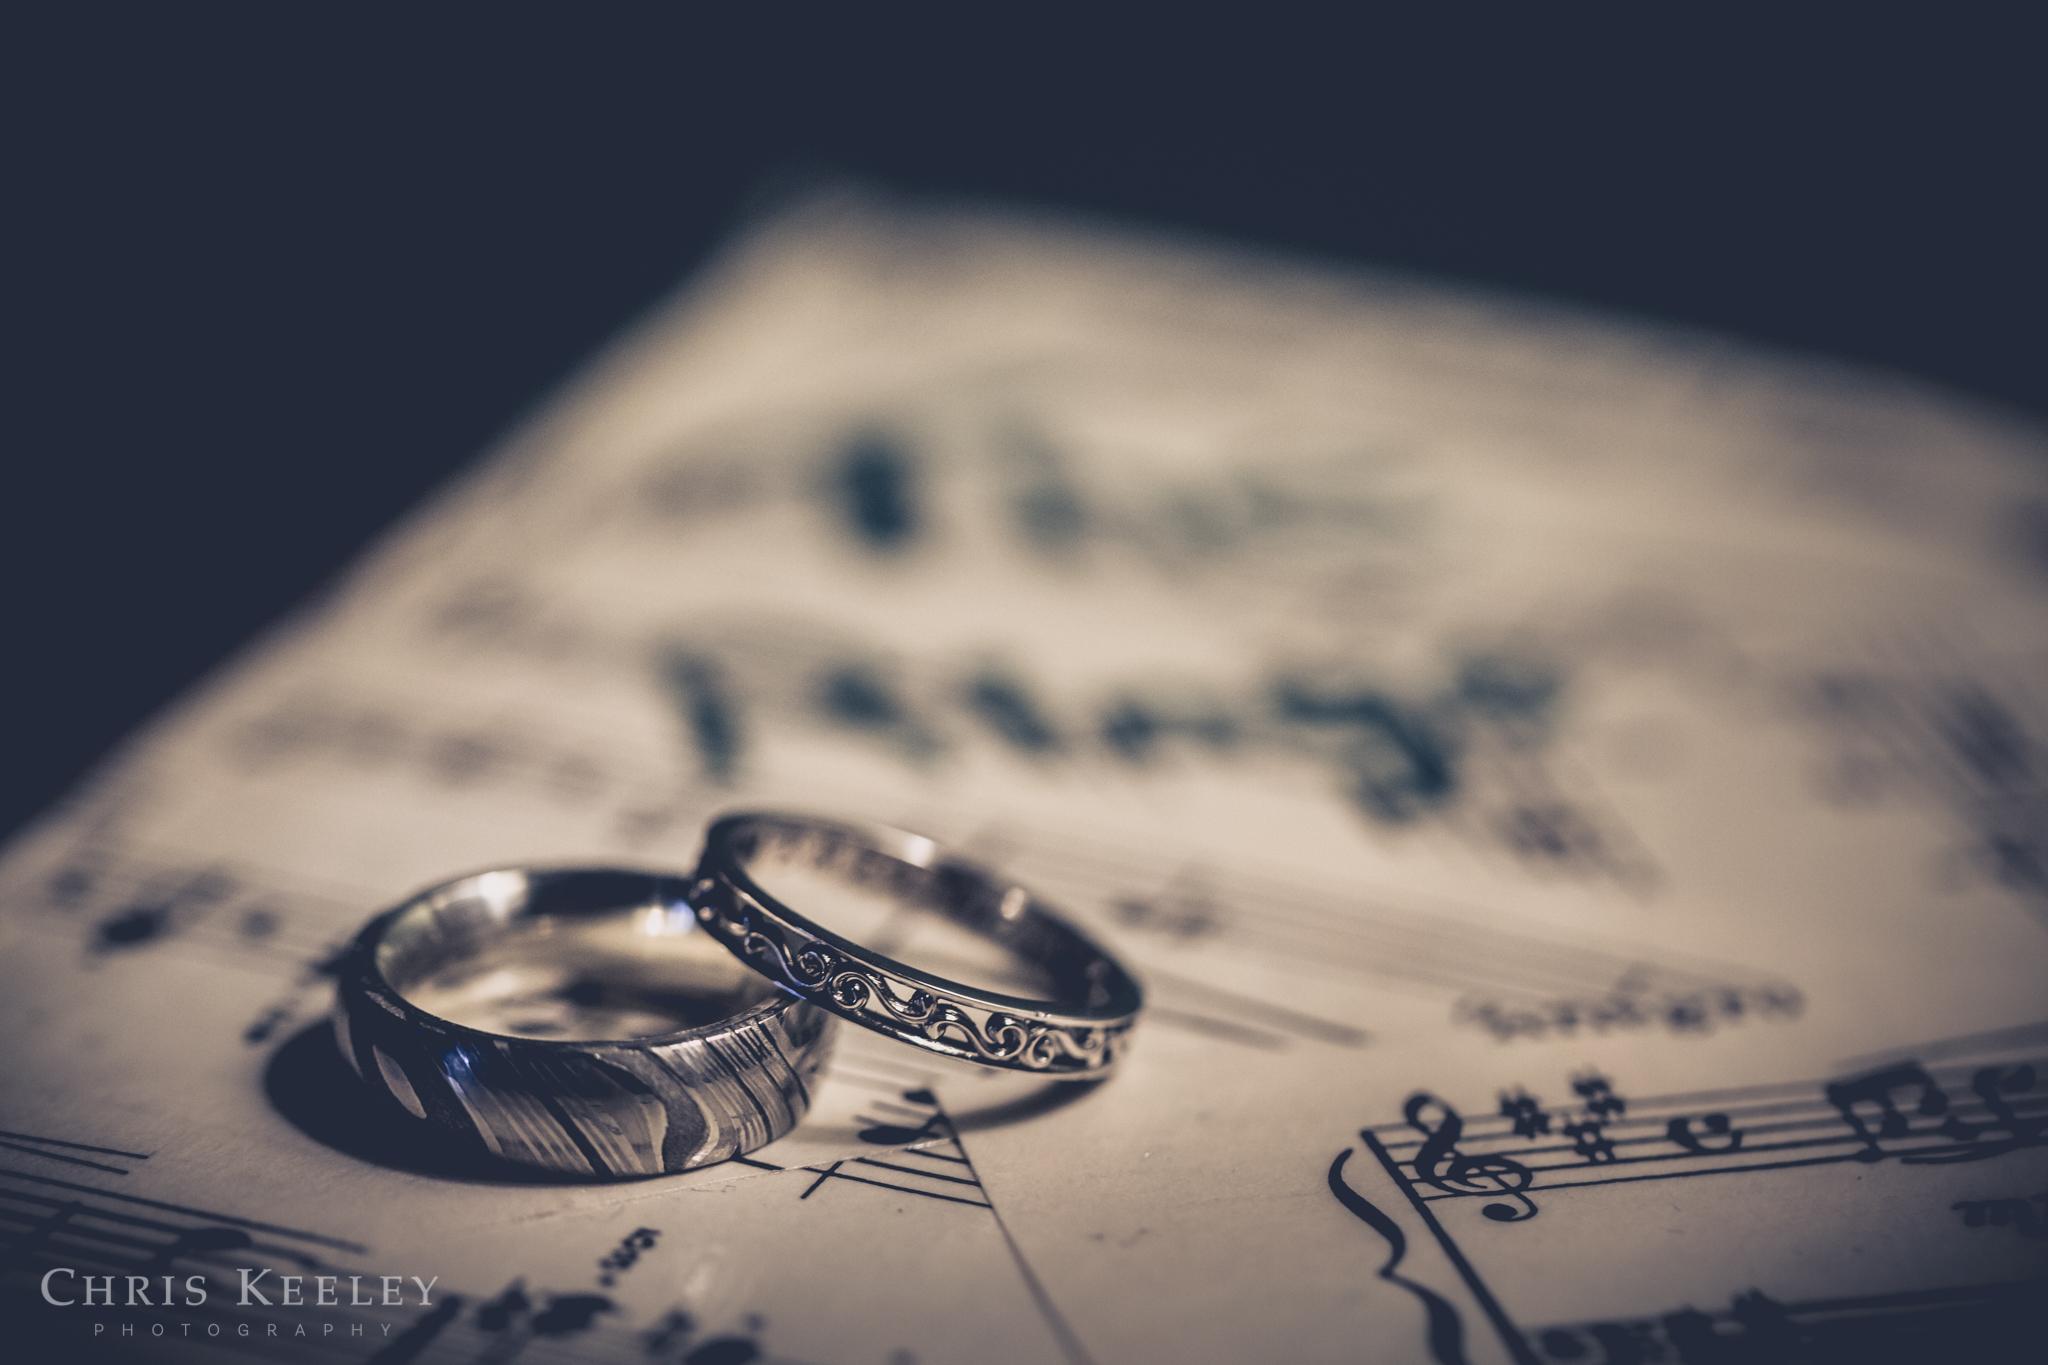 new-hampshire-wedding-photographer-three-chimneys-inn-chris-keeley-photography-01.jpg